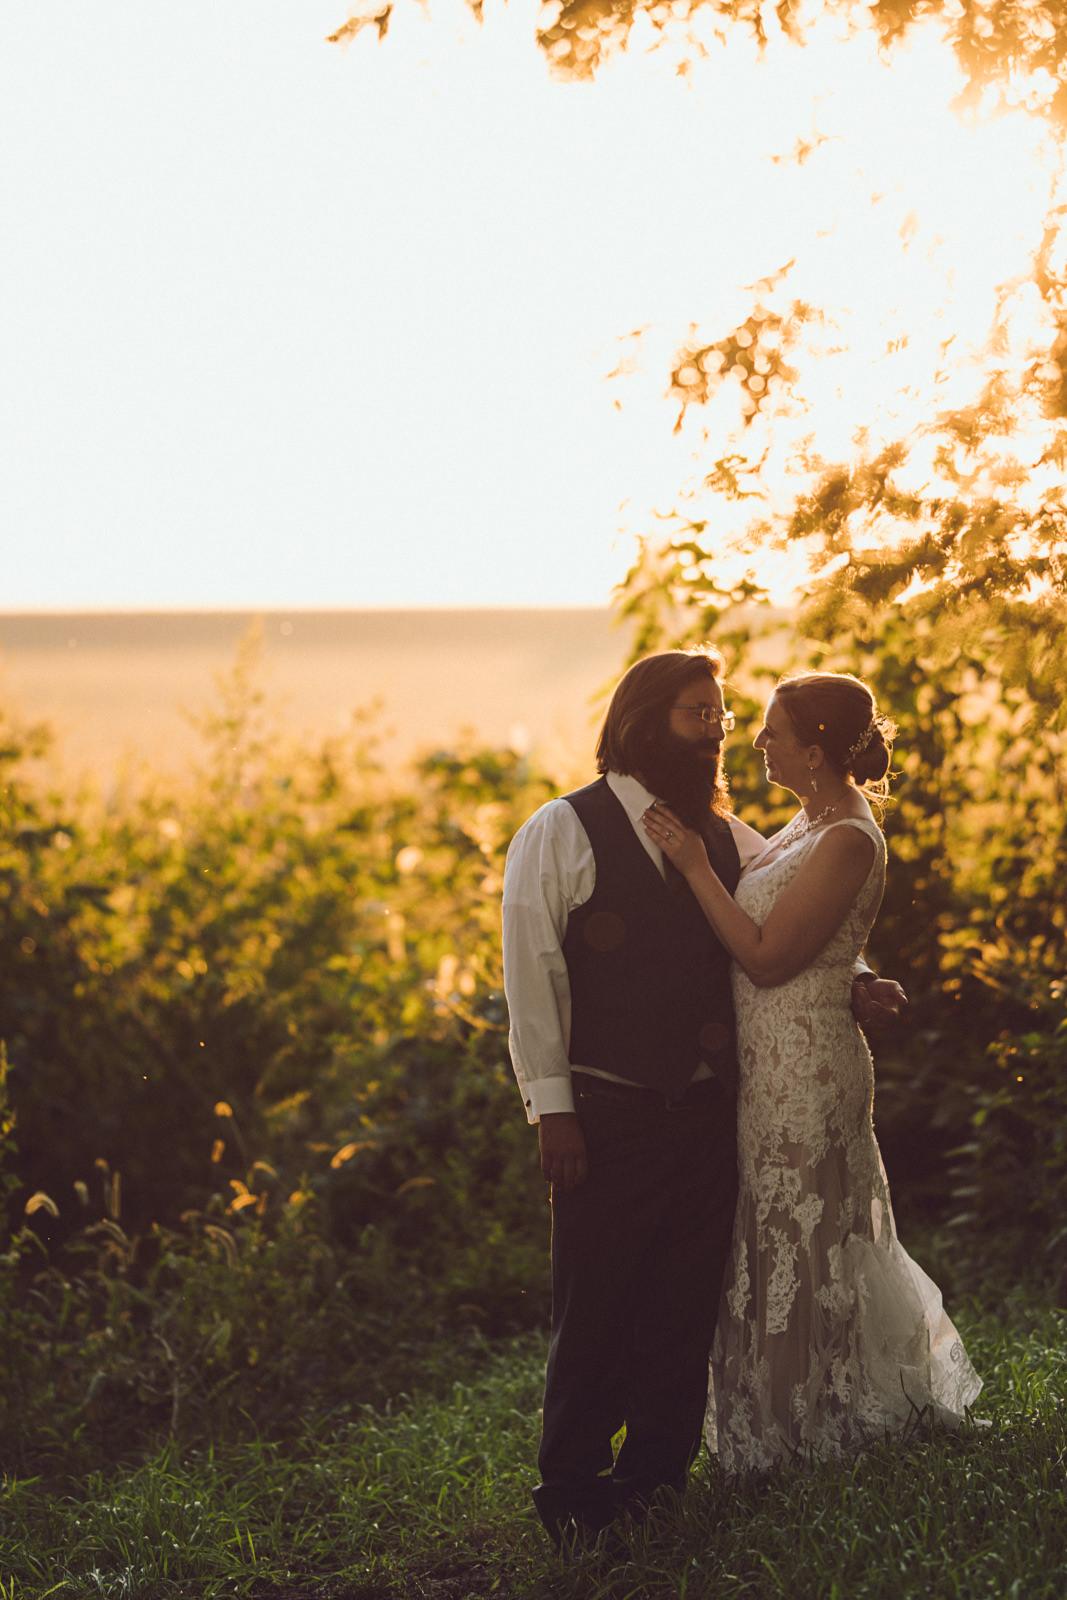 wedding-keely-caleb-1712-name-your-photo.jpg